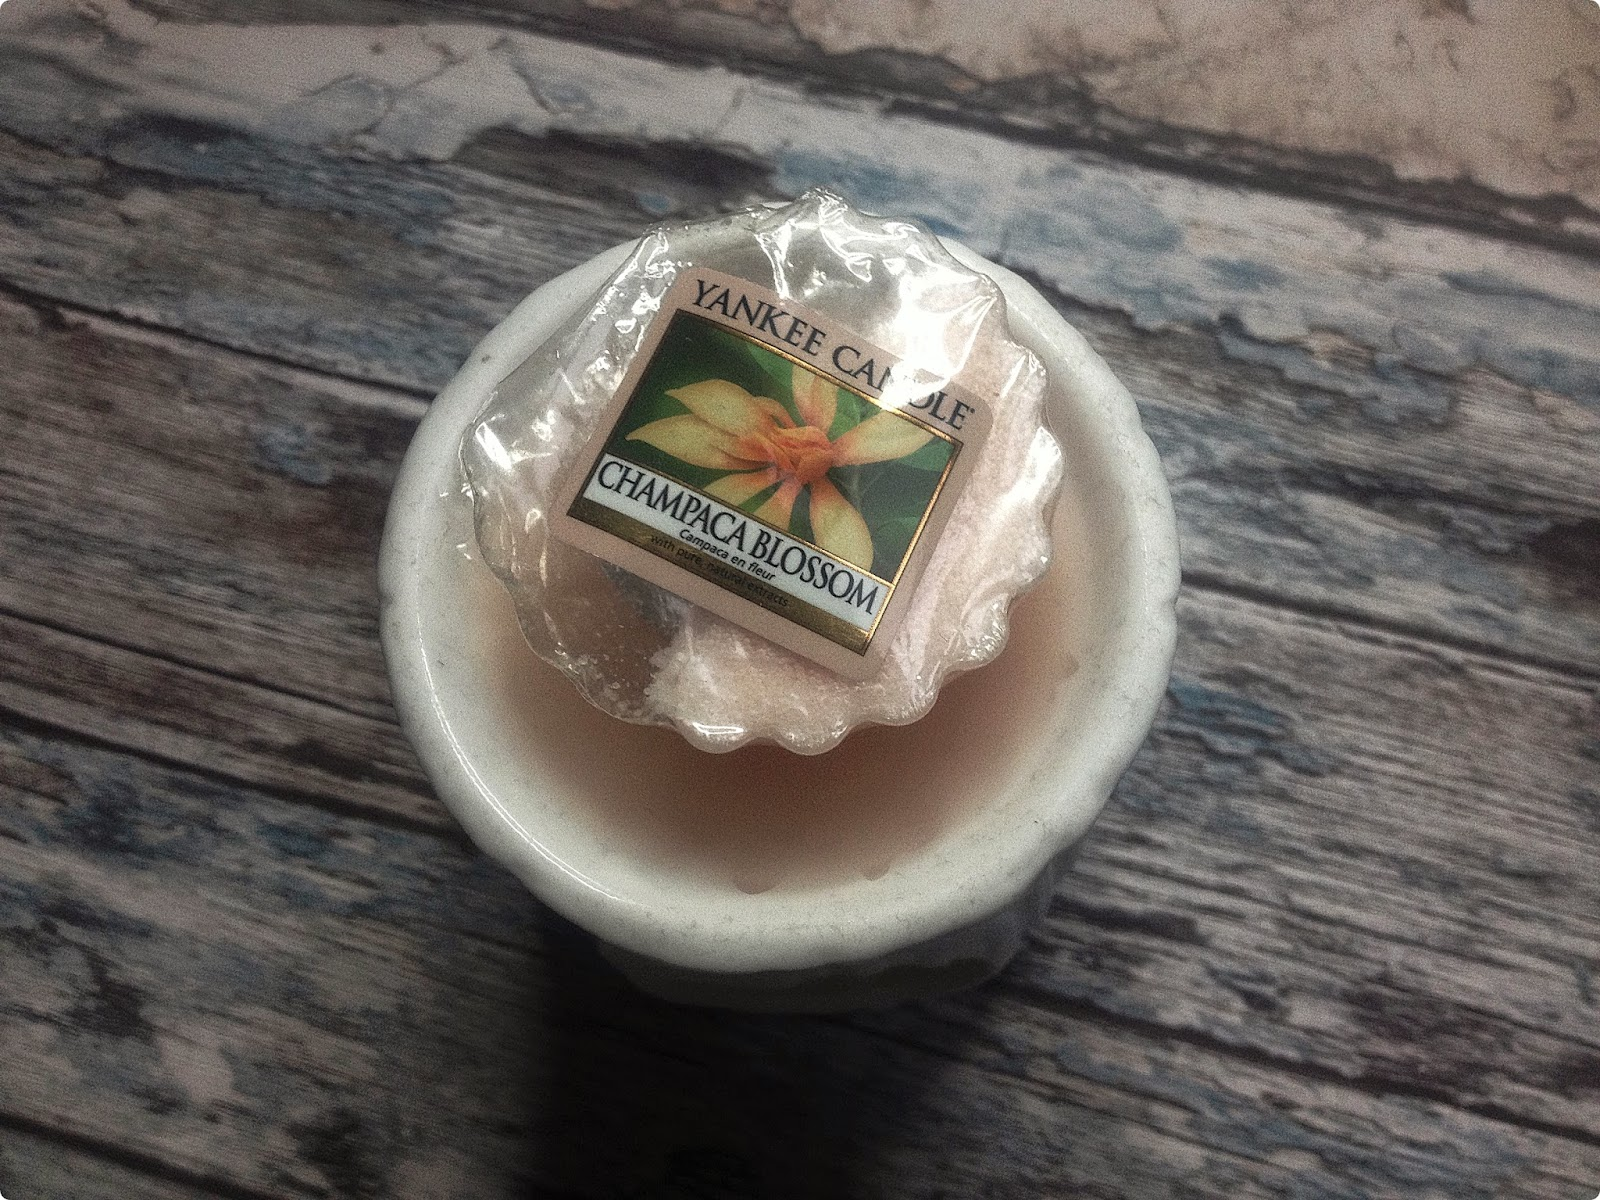 Champaca Blossom, Yankee Candle